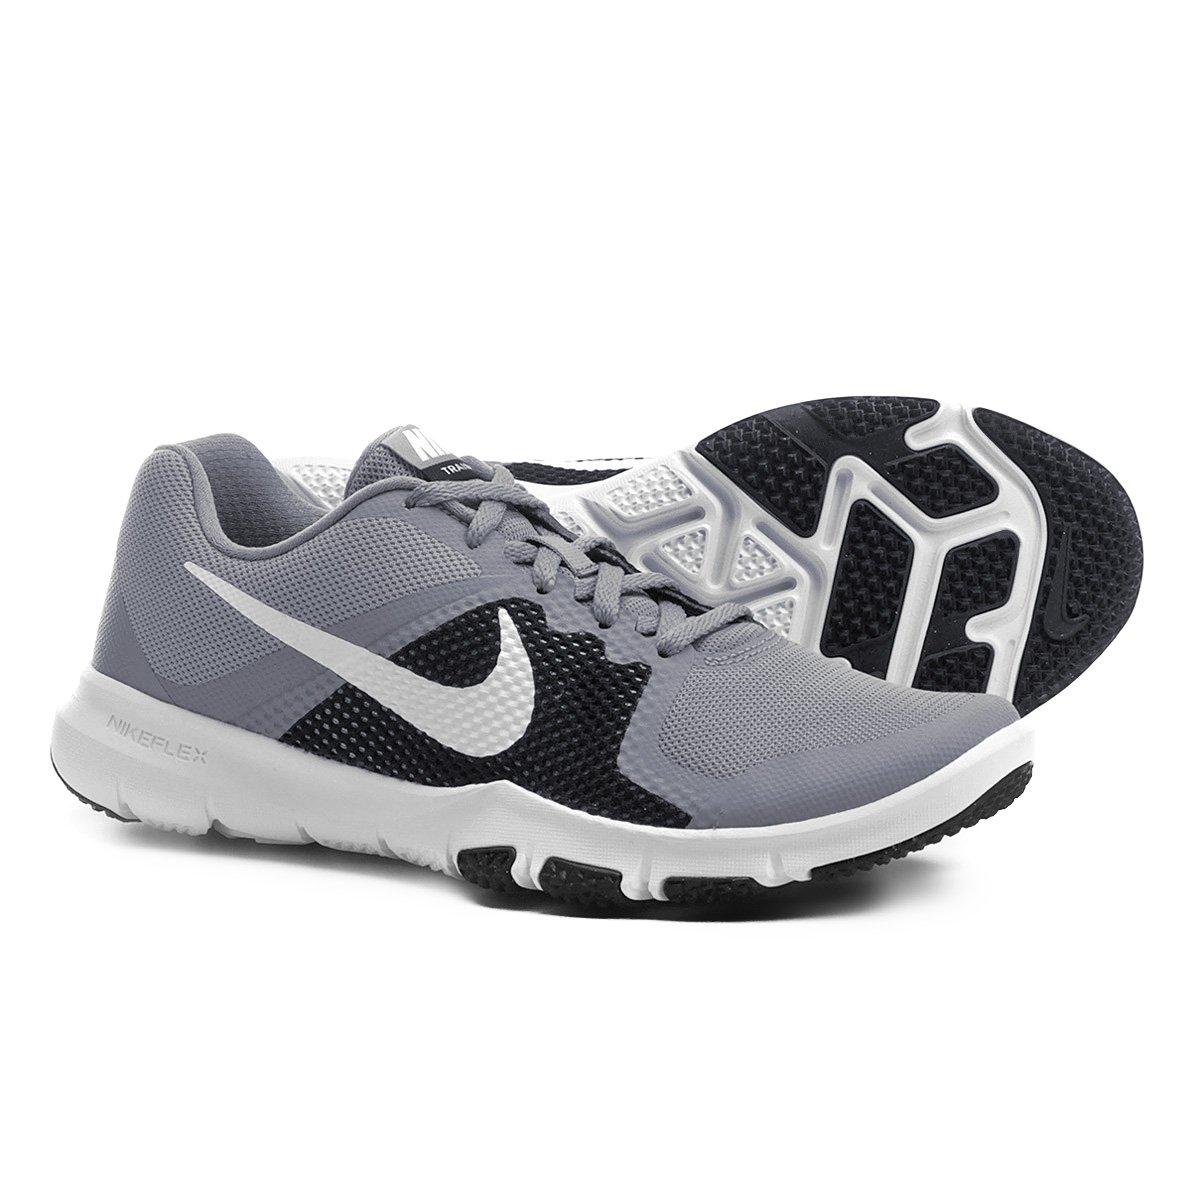 991d870714a Tênis Nike Flex Control Masculino - Compre Agora